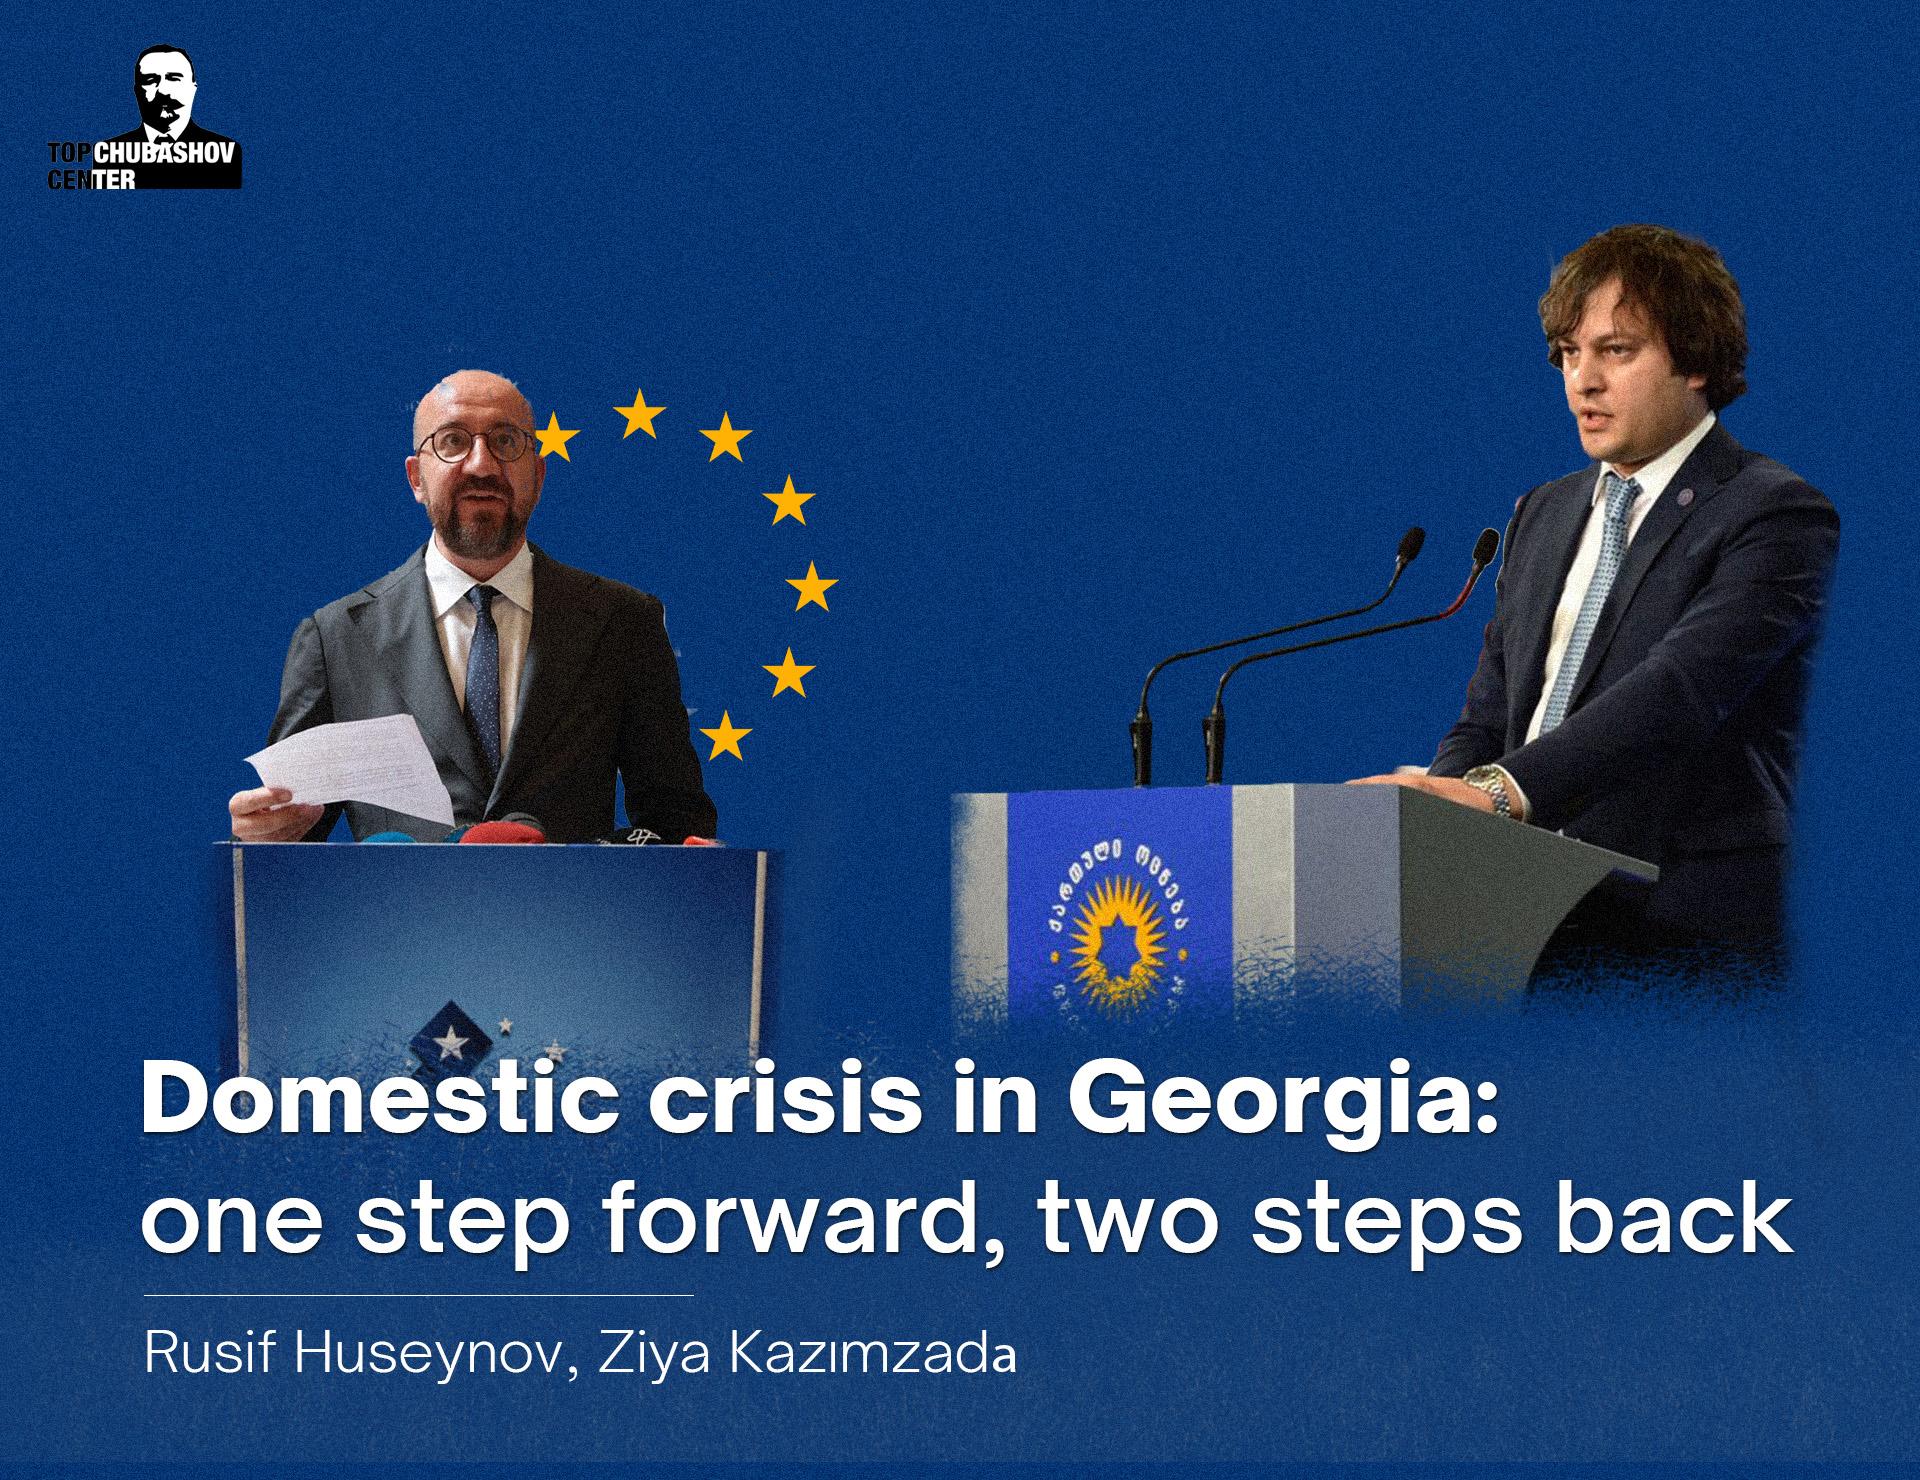 Domestic crisis in Georgia: one step forward, two steps back